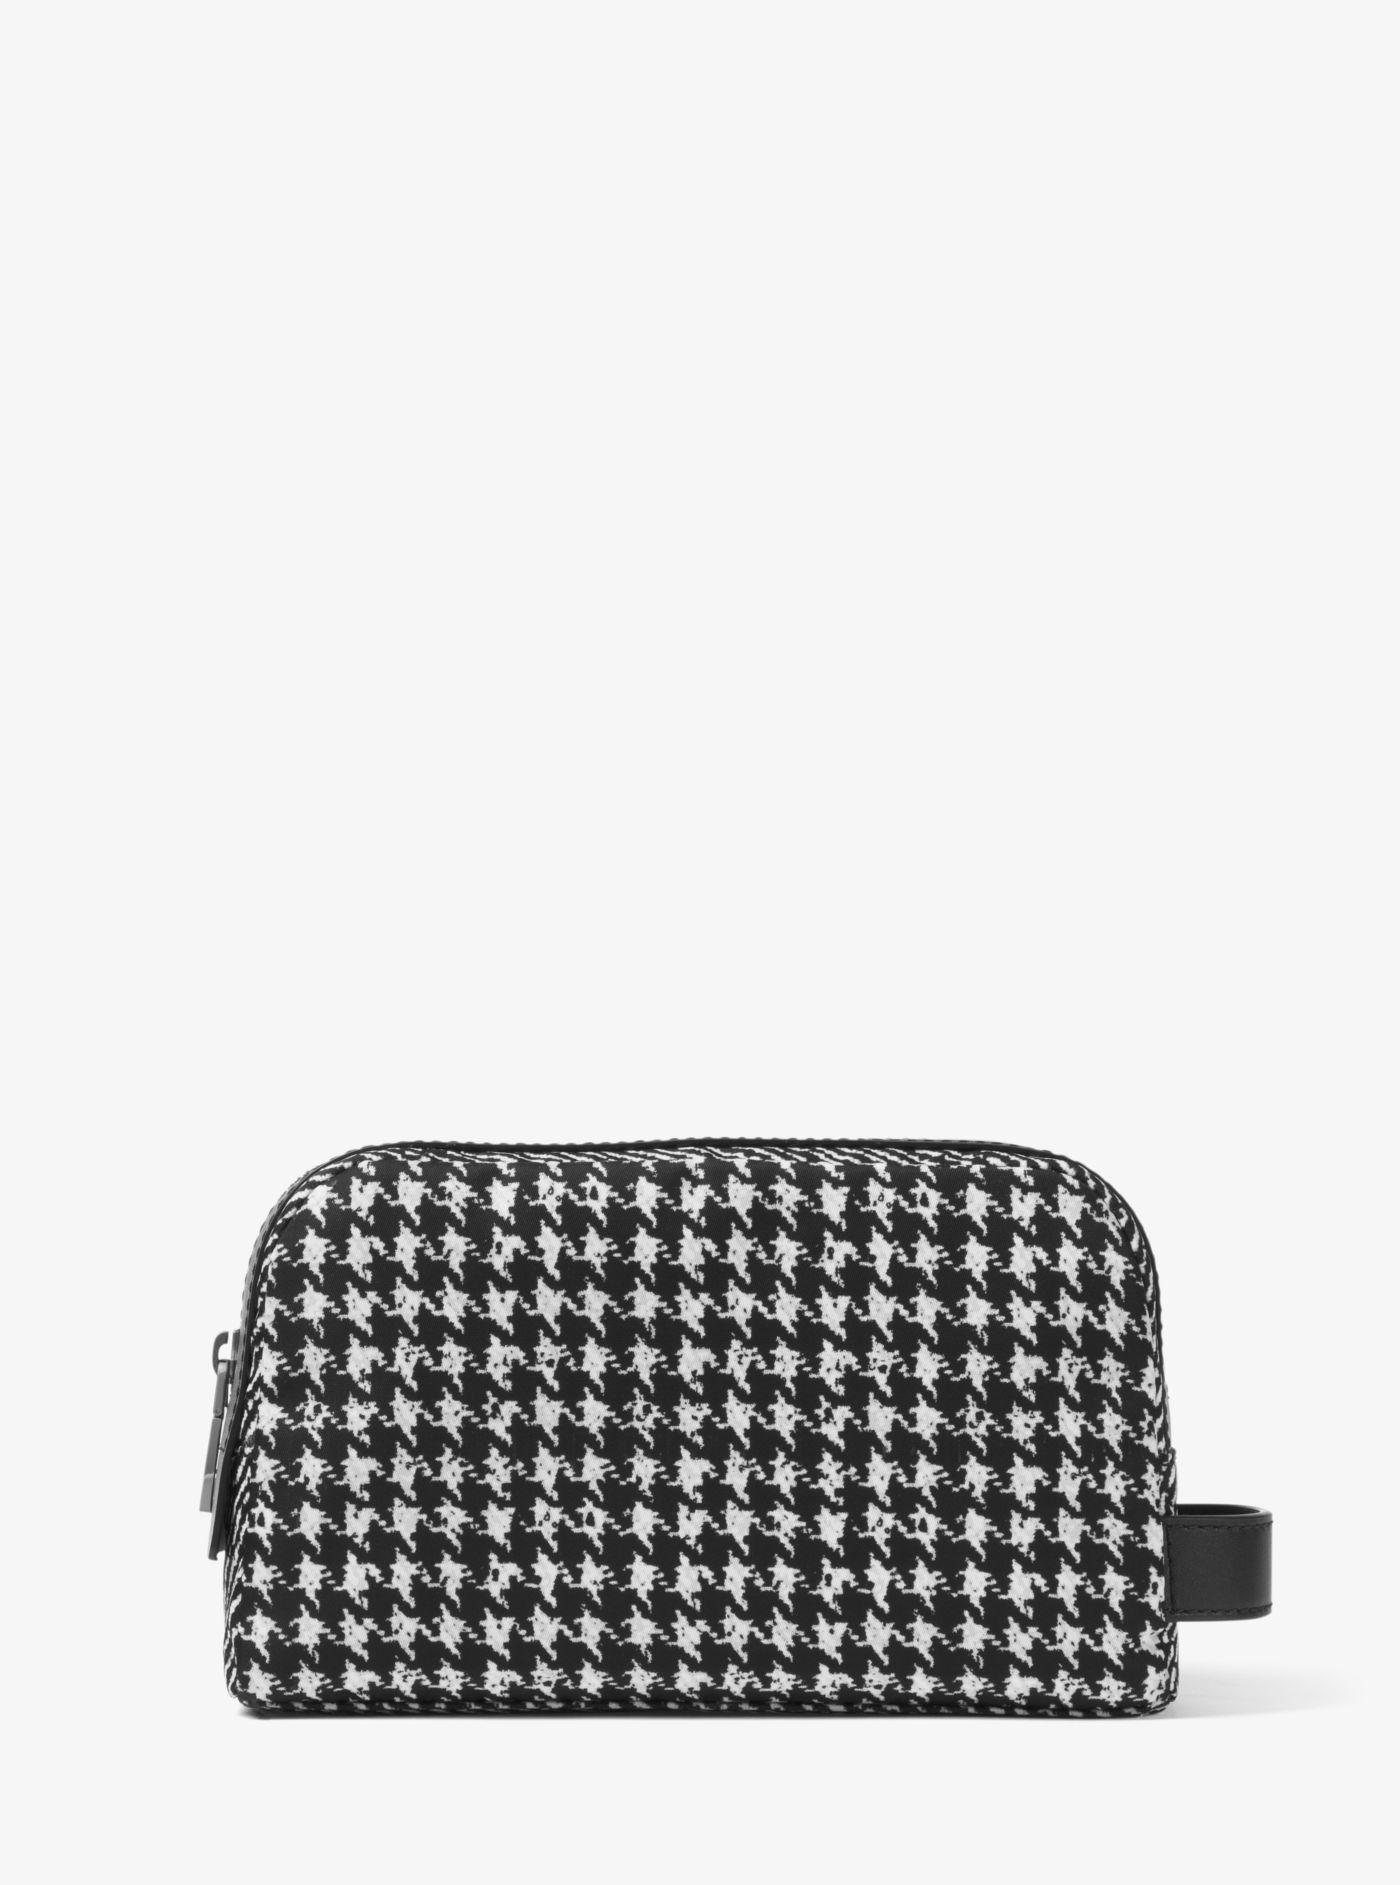 e2a8beaafdd2 ... where to buy michael kors black kent small printed nylon travel pouch  for men lyst.